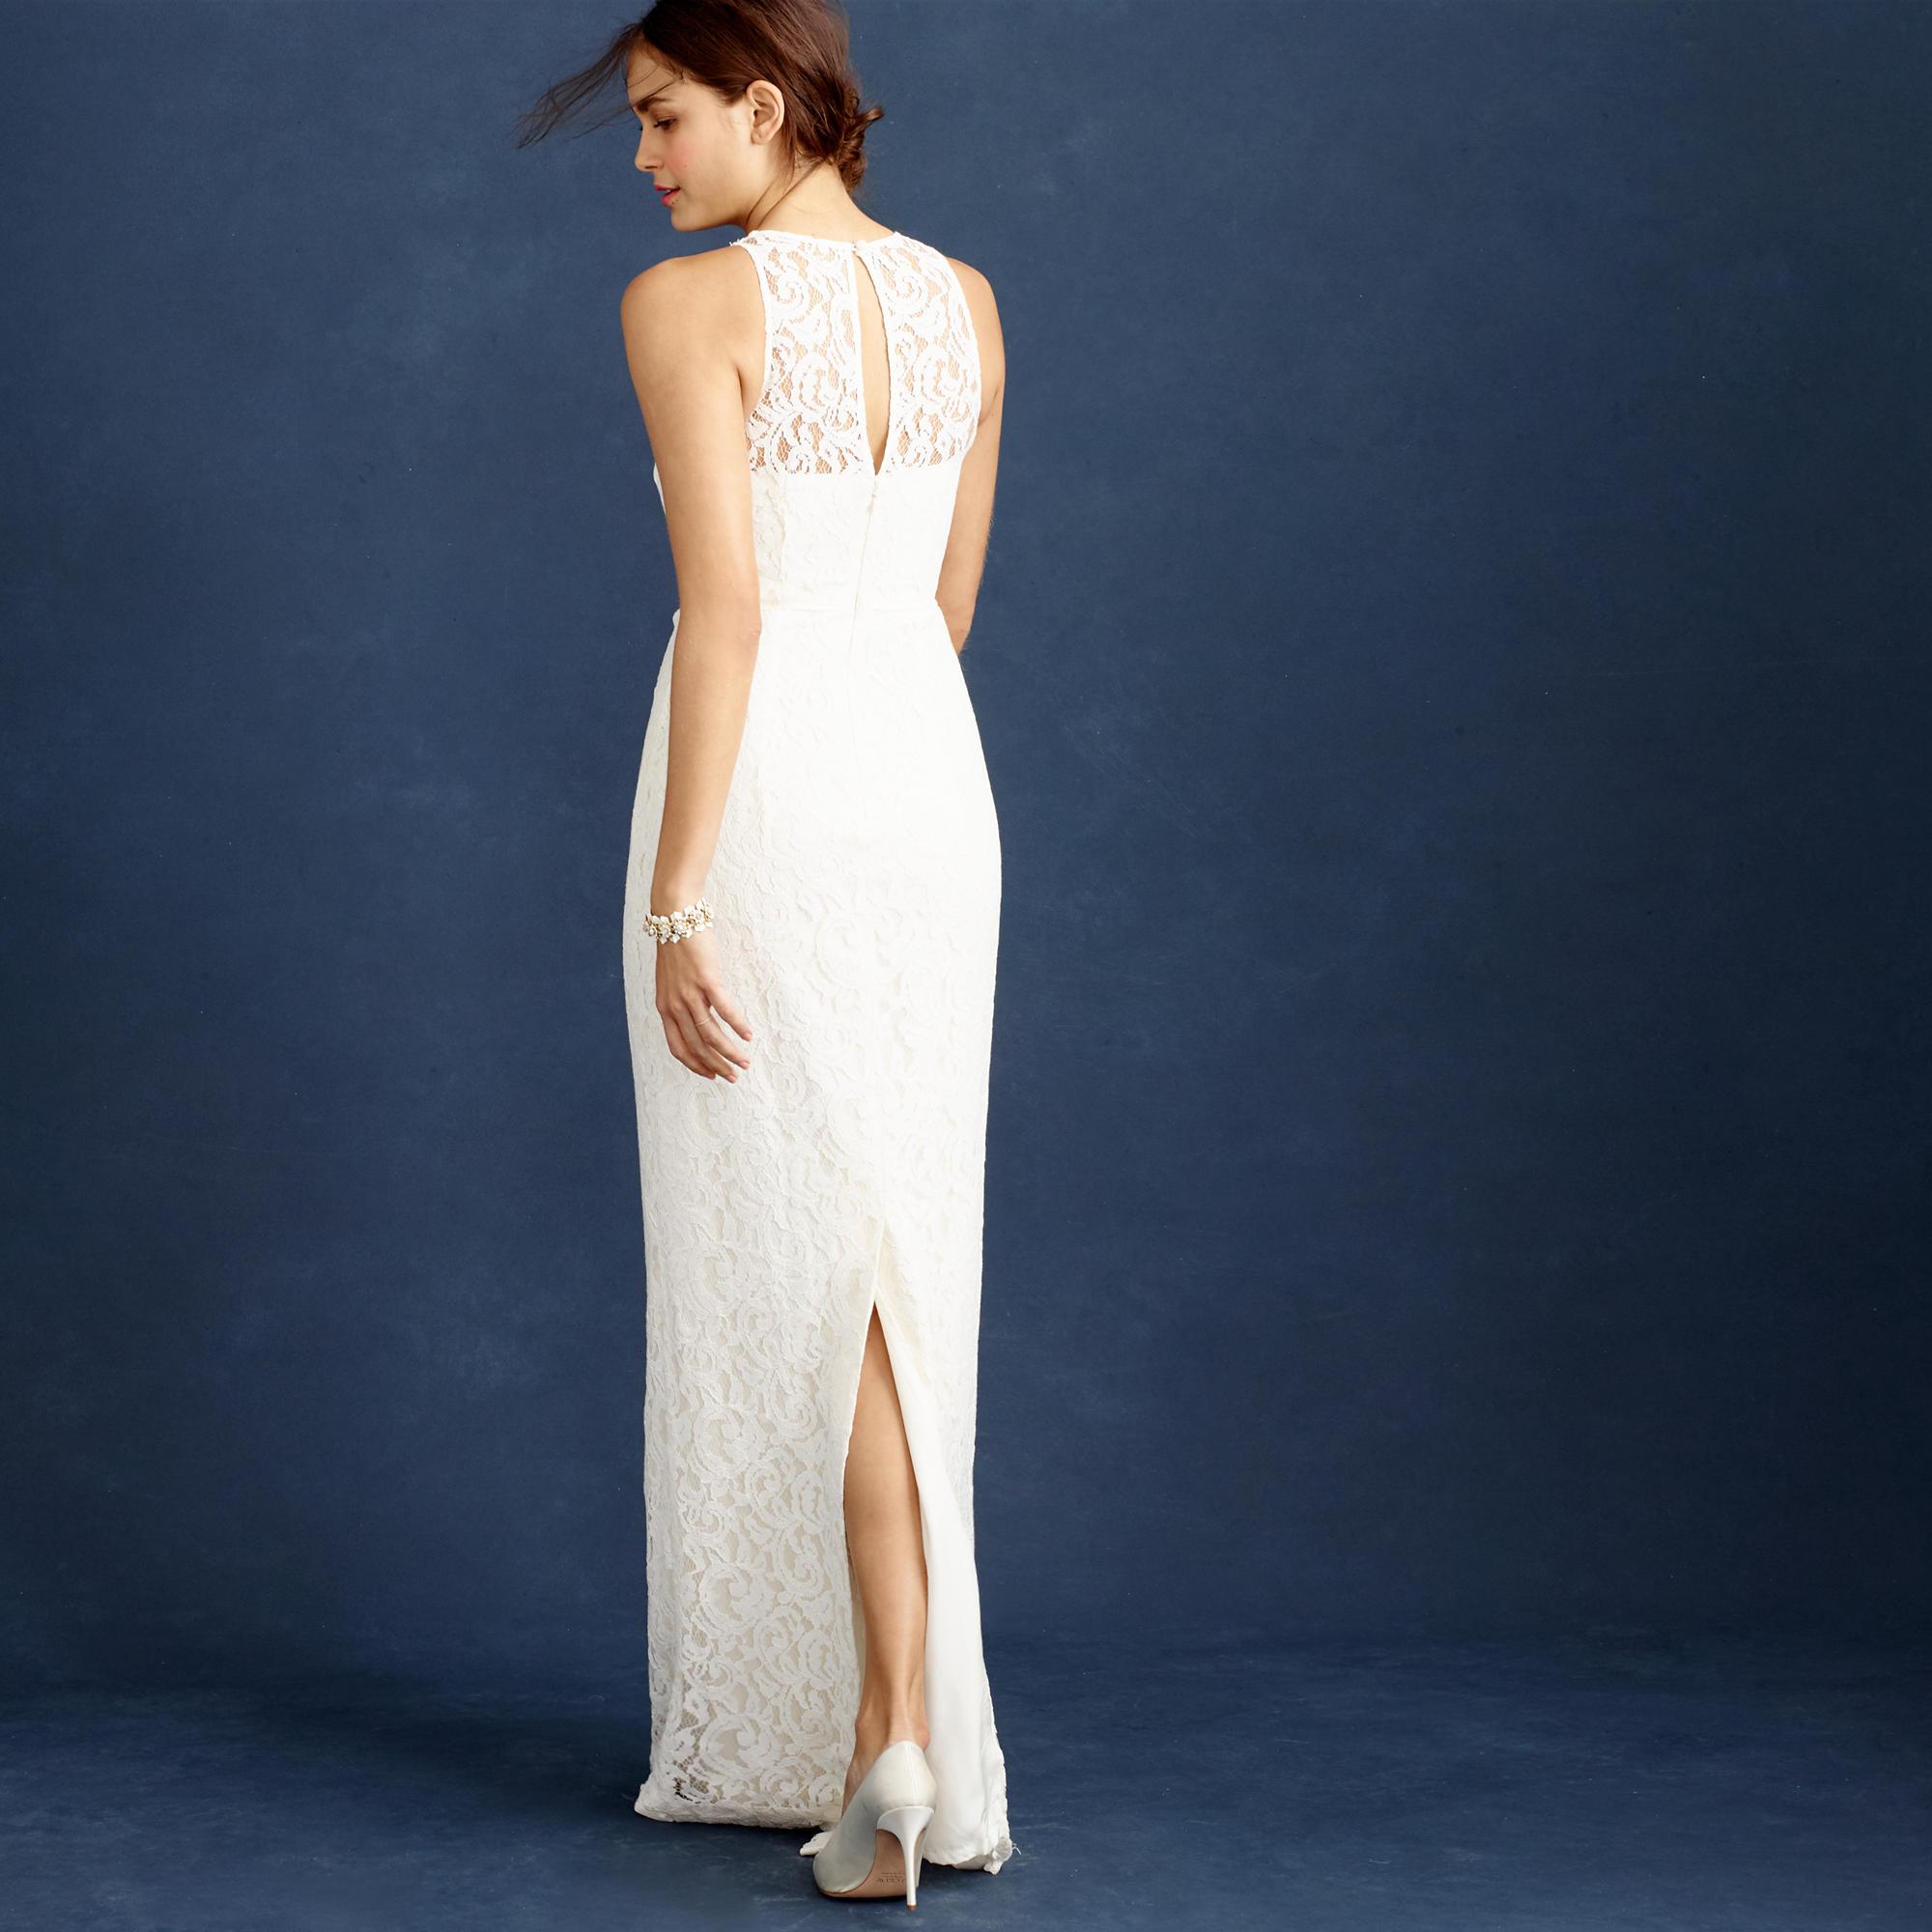 C j crew wedding dress Pamela gown